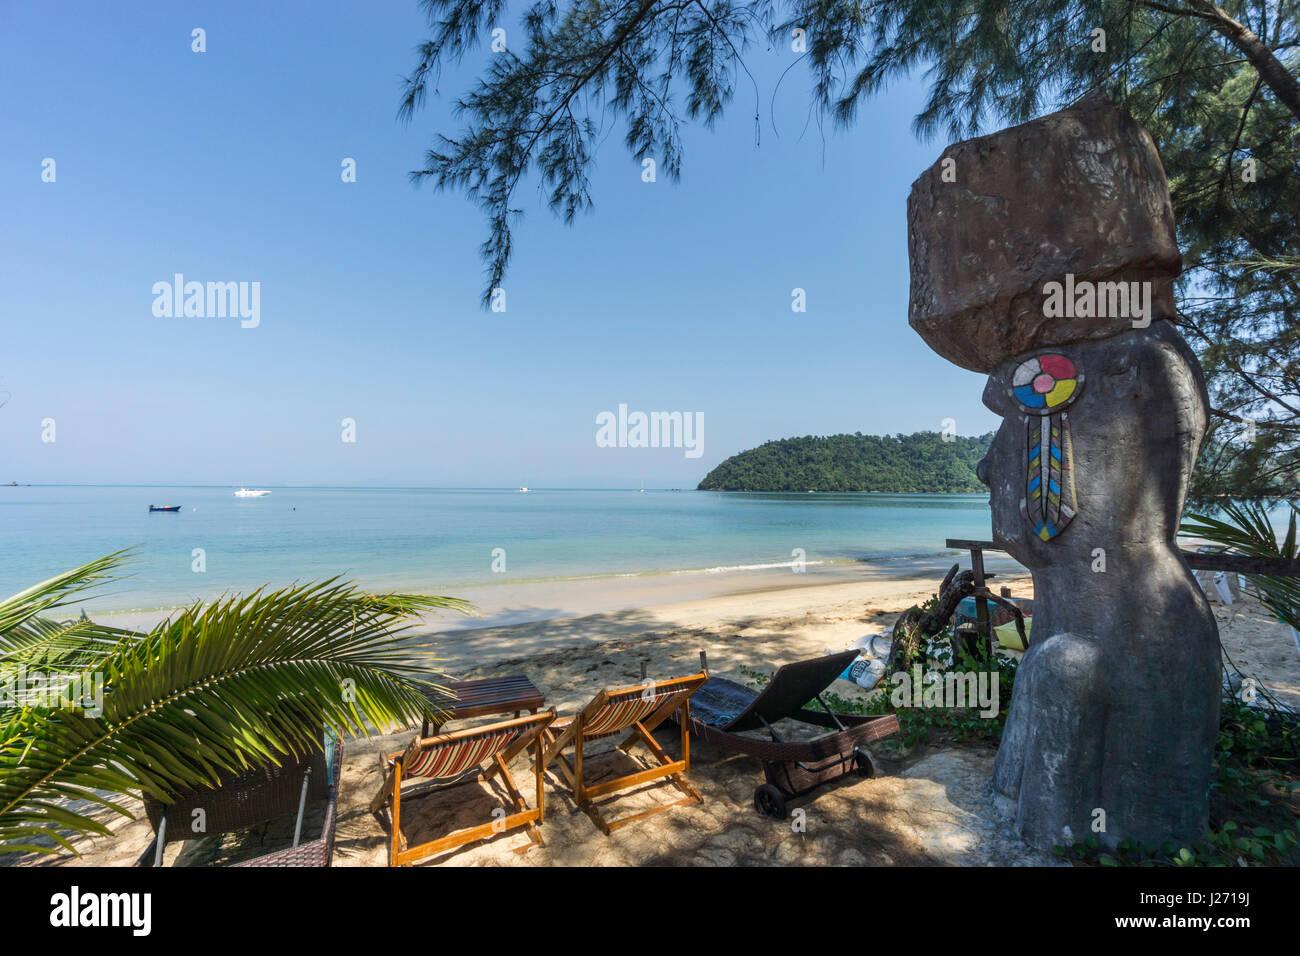 Buffalo Bay, Ao Khao Kwai, Sculpture, Resort, beach chairs,  Koh Phayam, Thailand - Stock Image